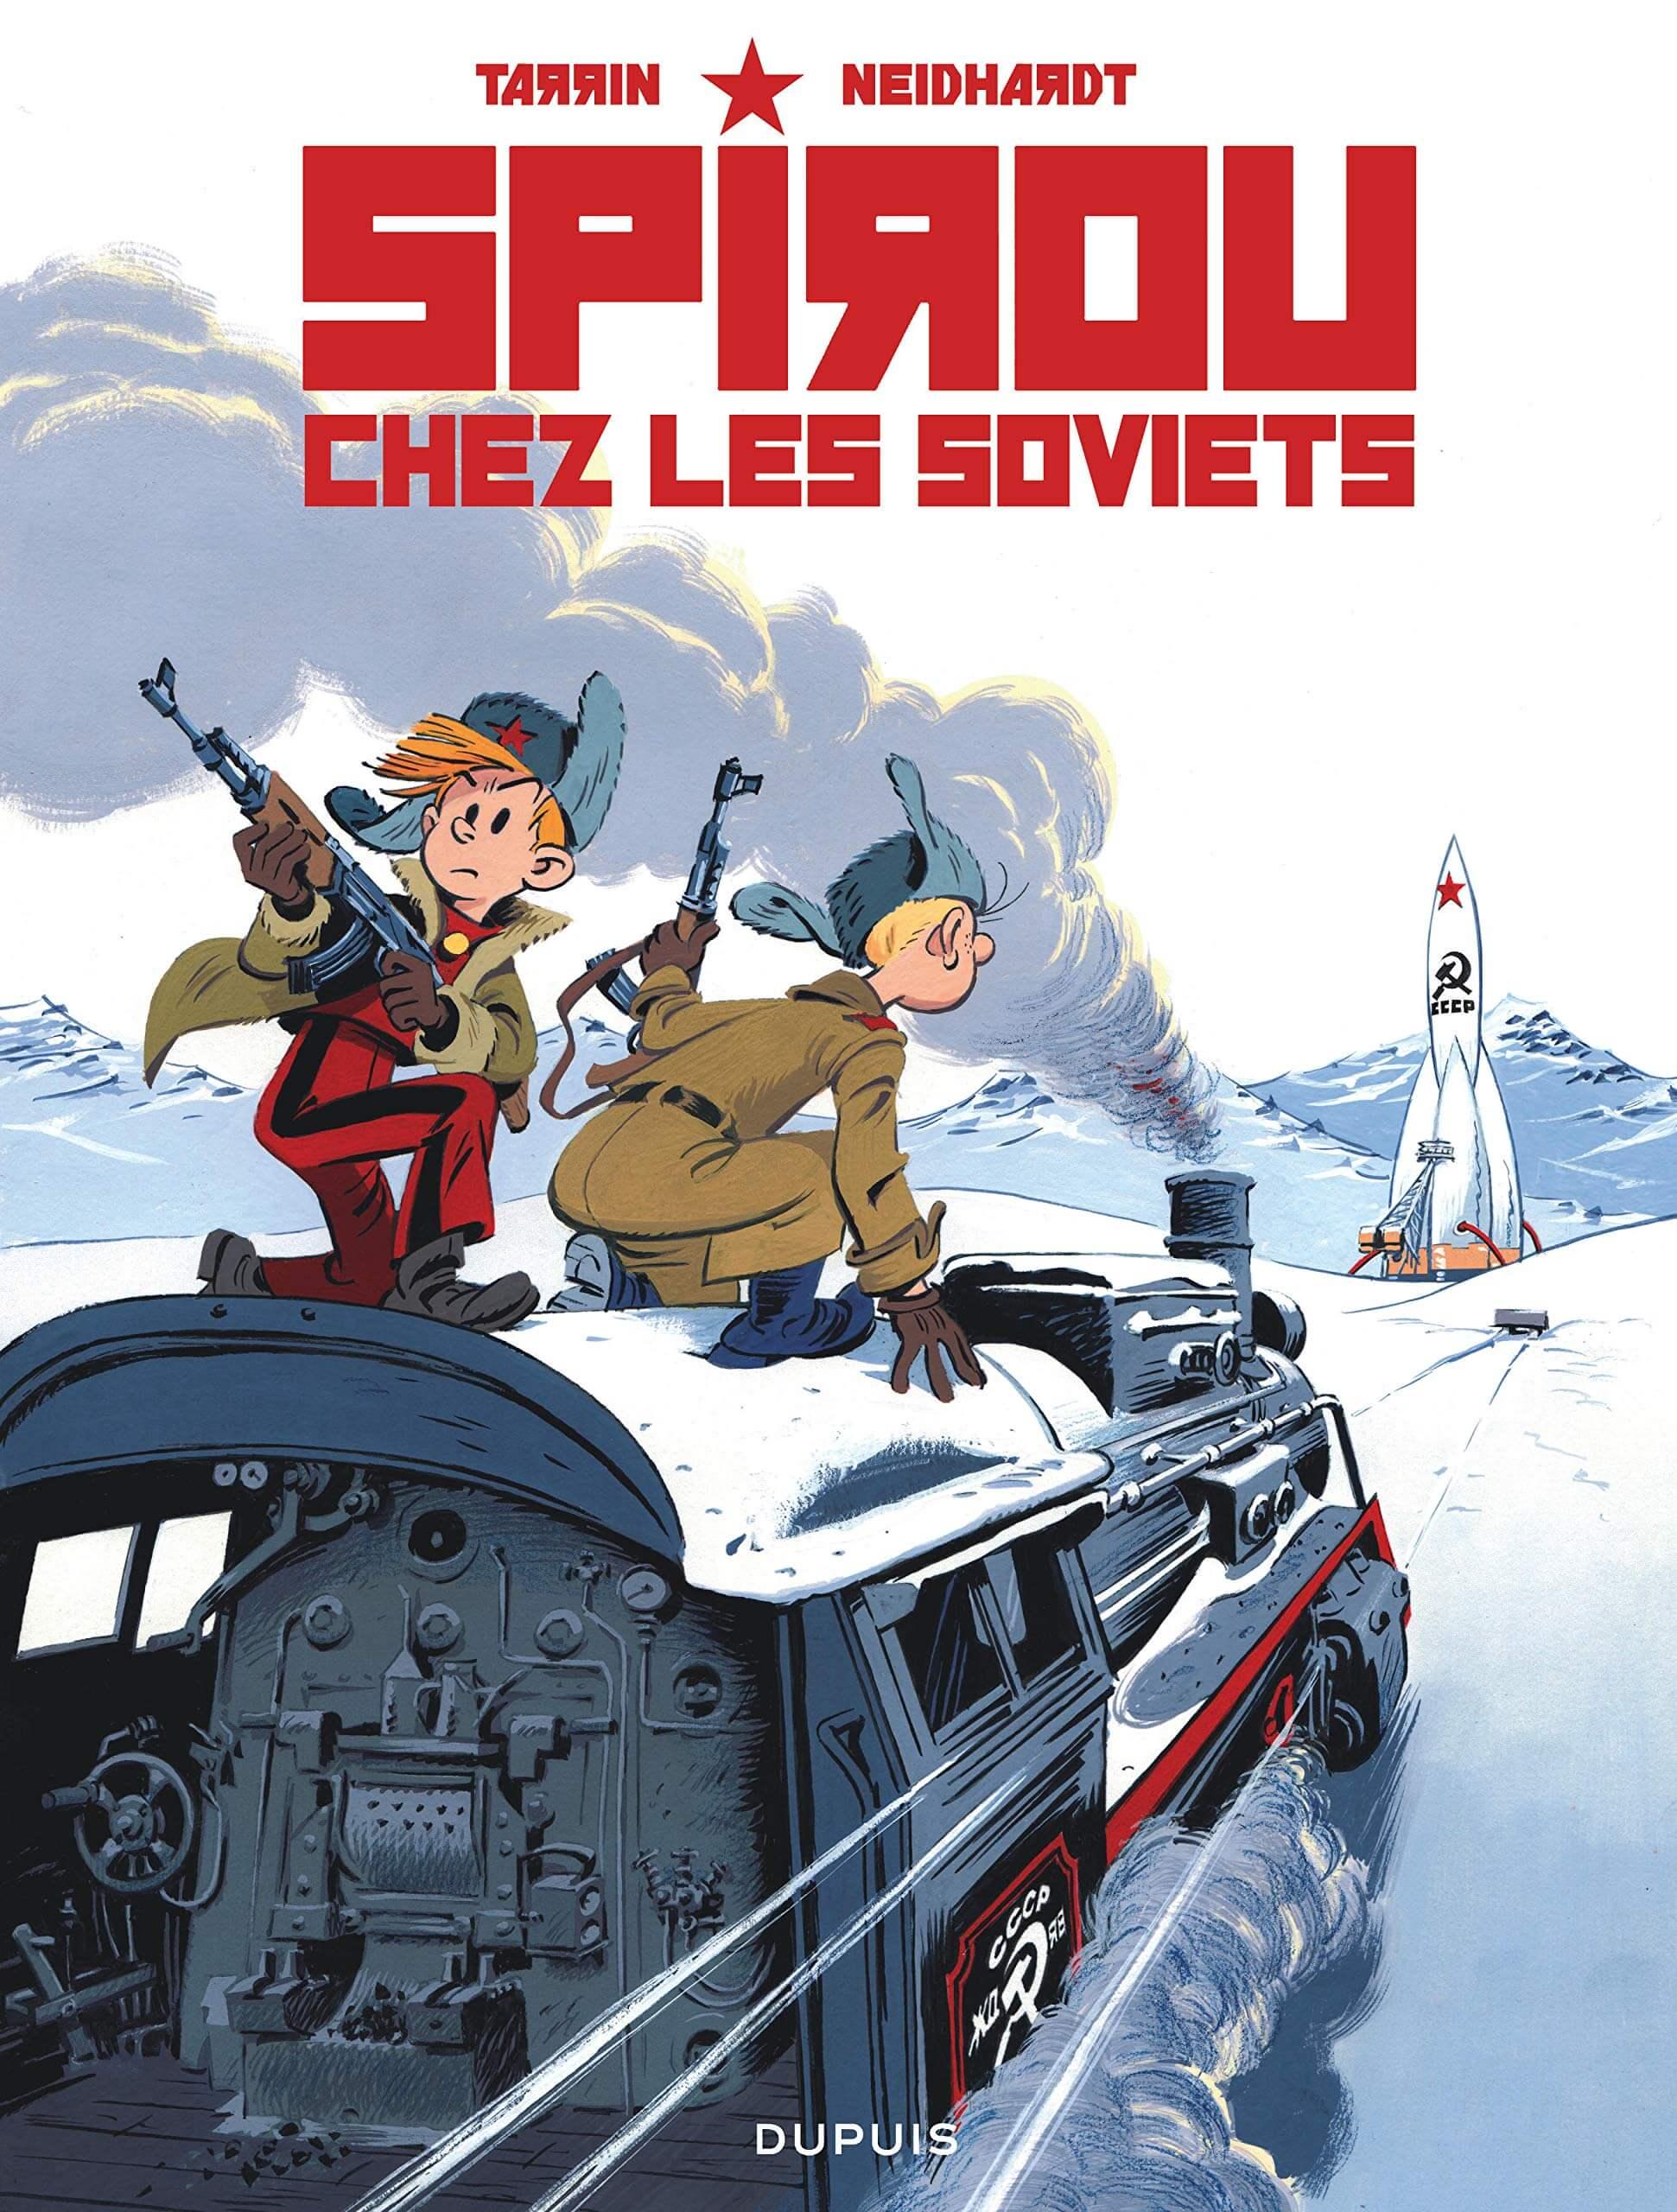 Spirou y los soviets (Tarrin & Neidhardt, 2020)